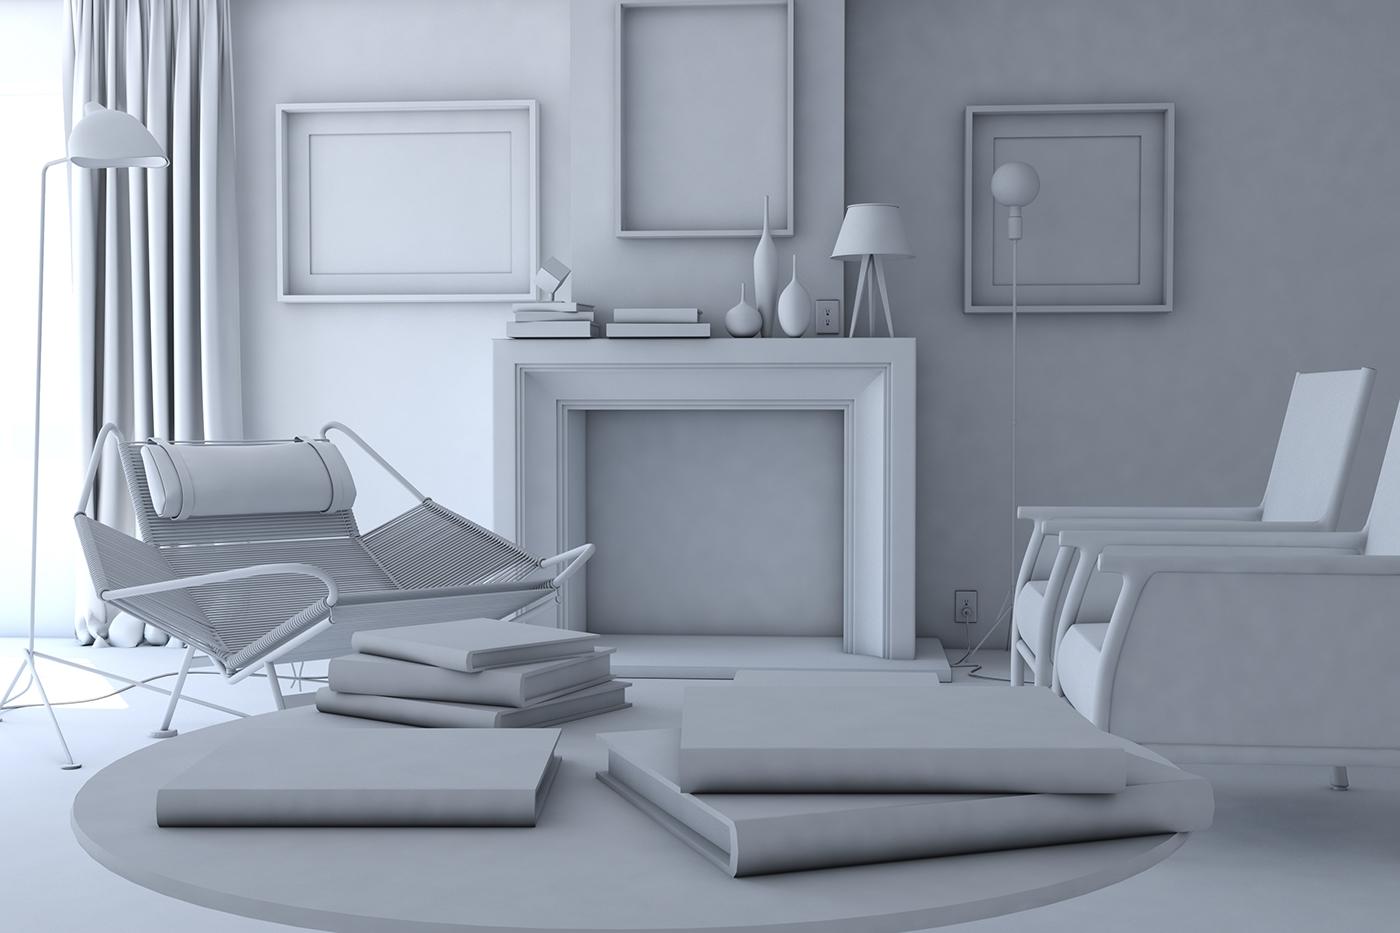 Living Room Interior 3D Model   Occlusion Render